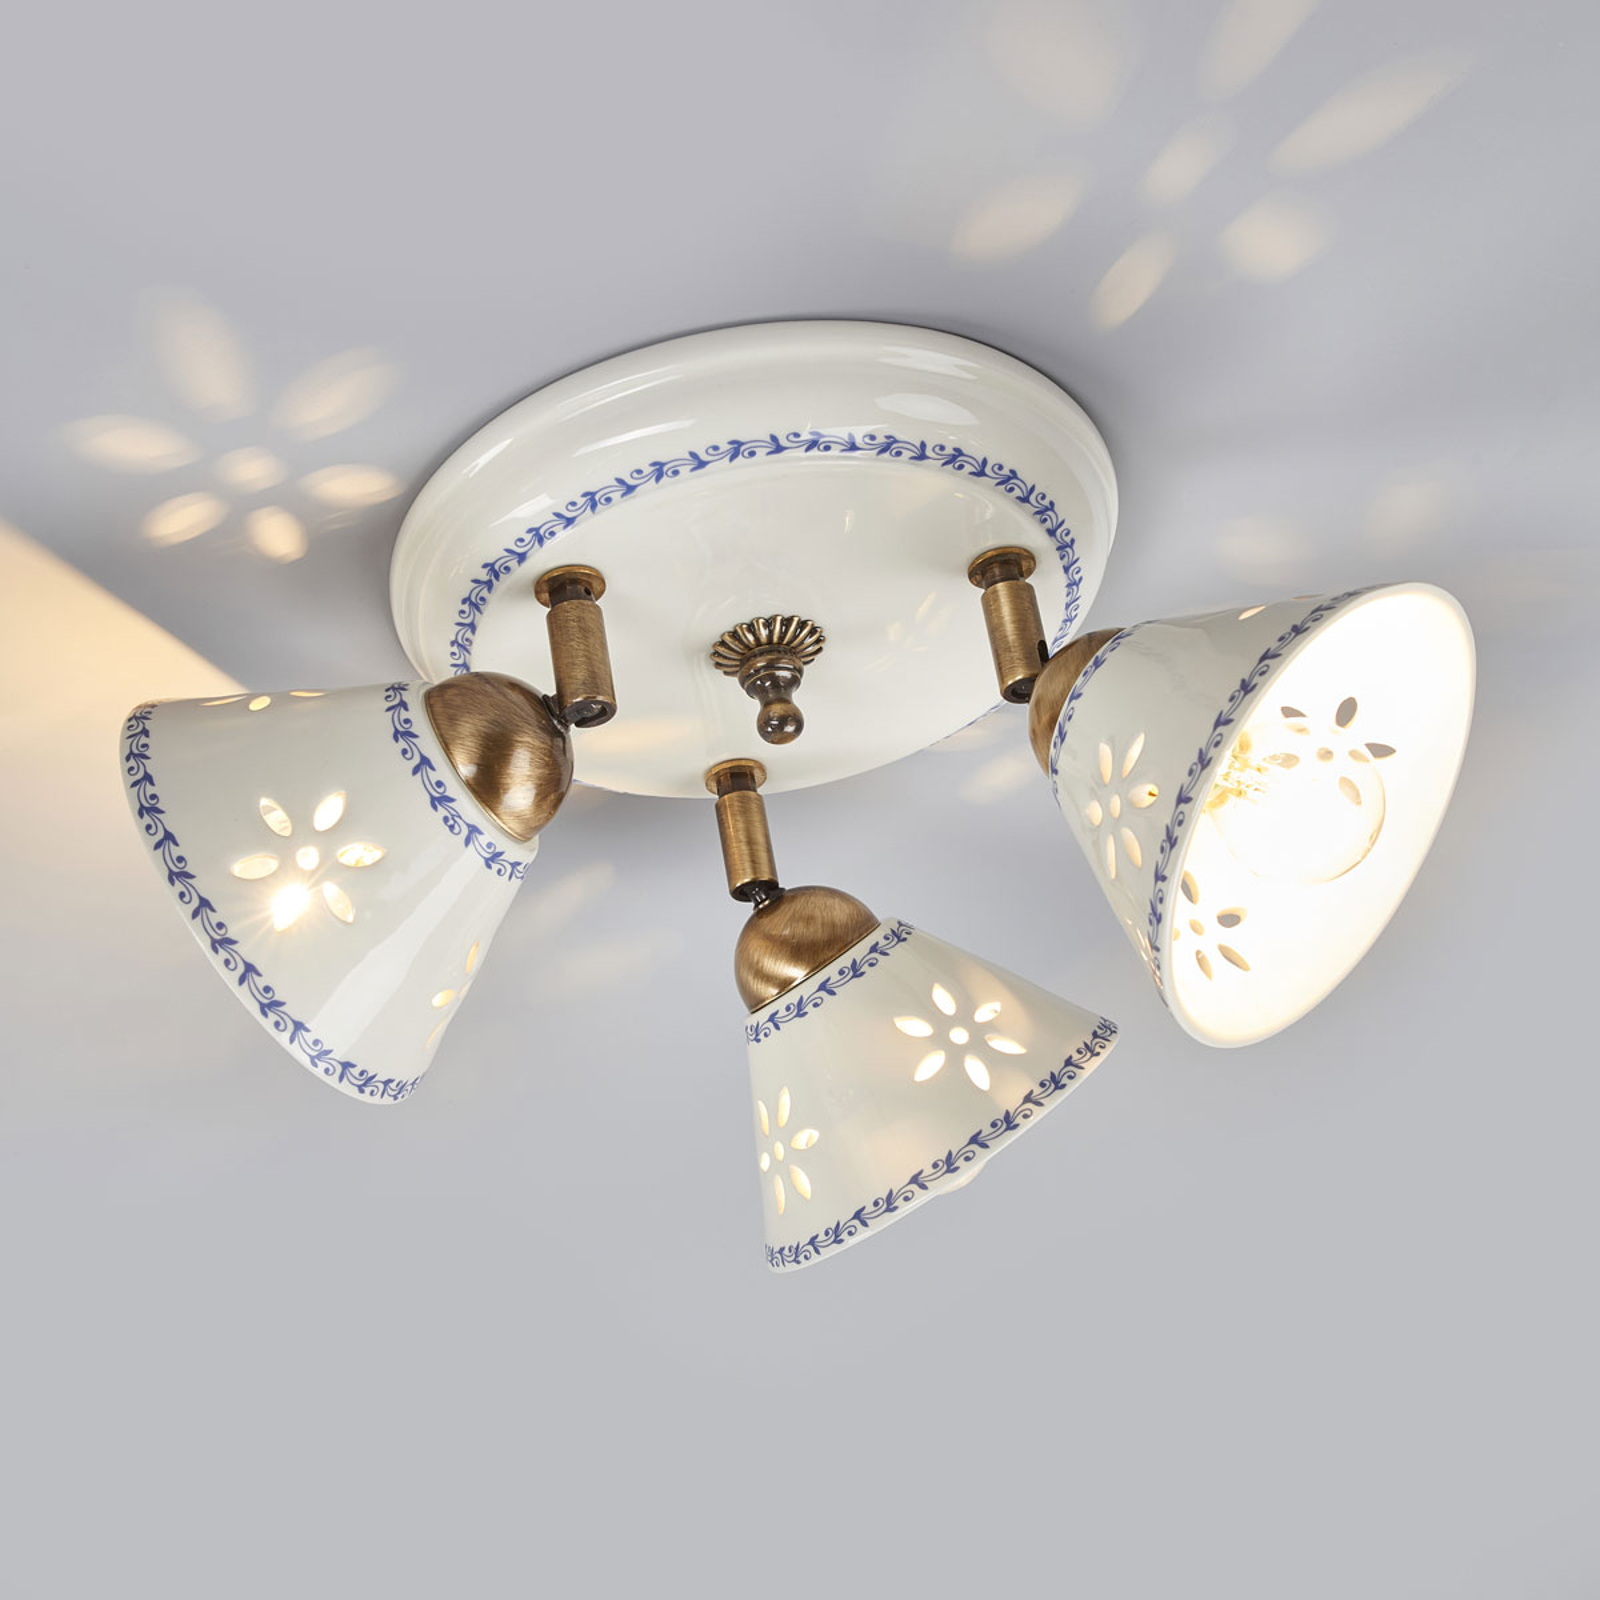 NONNA ceiling light, made of white ceramic, 3-bulb_2013023_1